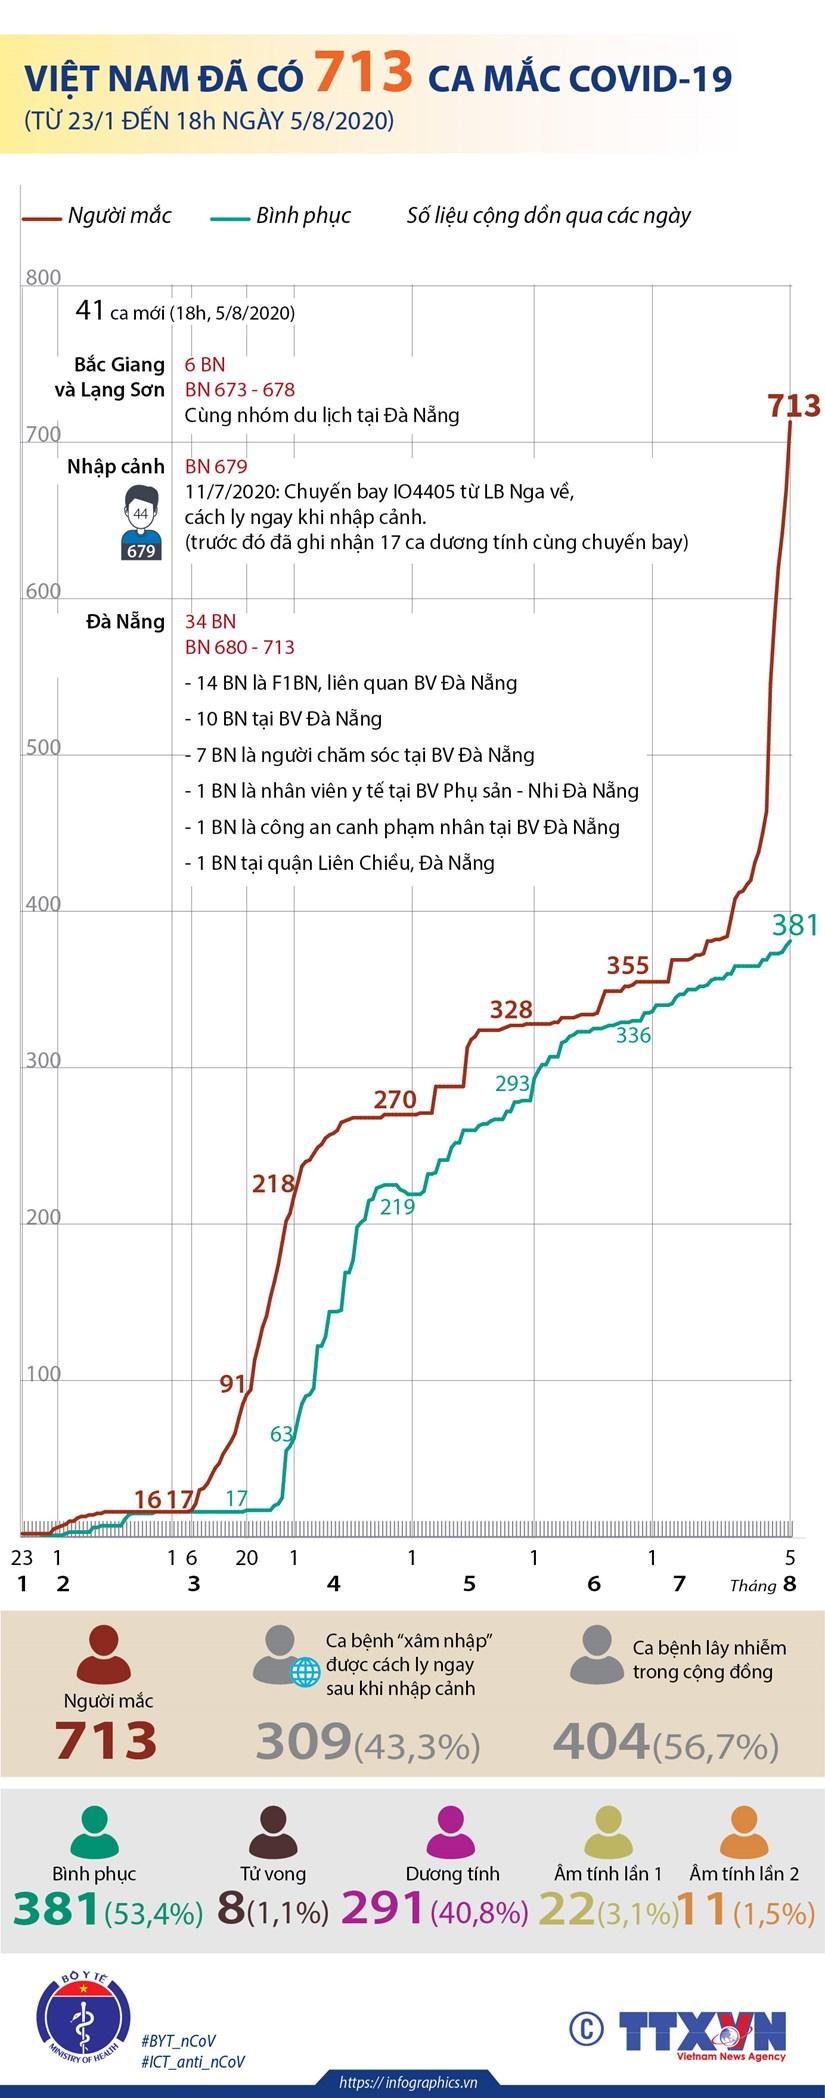 [Infographics] Viet Nam da ghi nhan 713 ca mac COVID-19 hinh anh 1